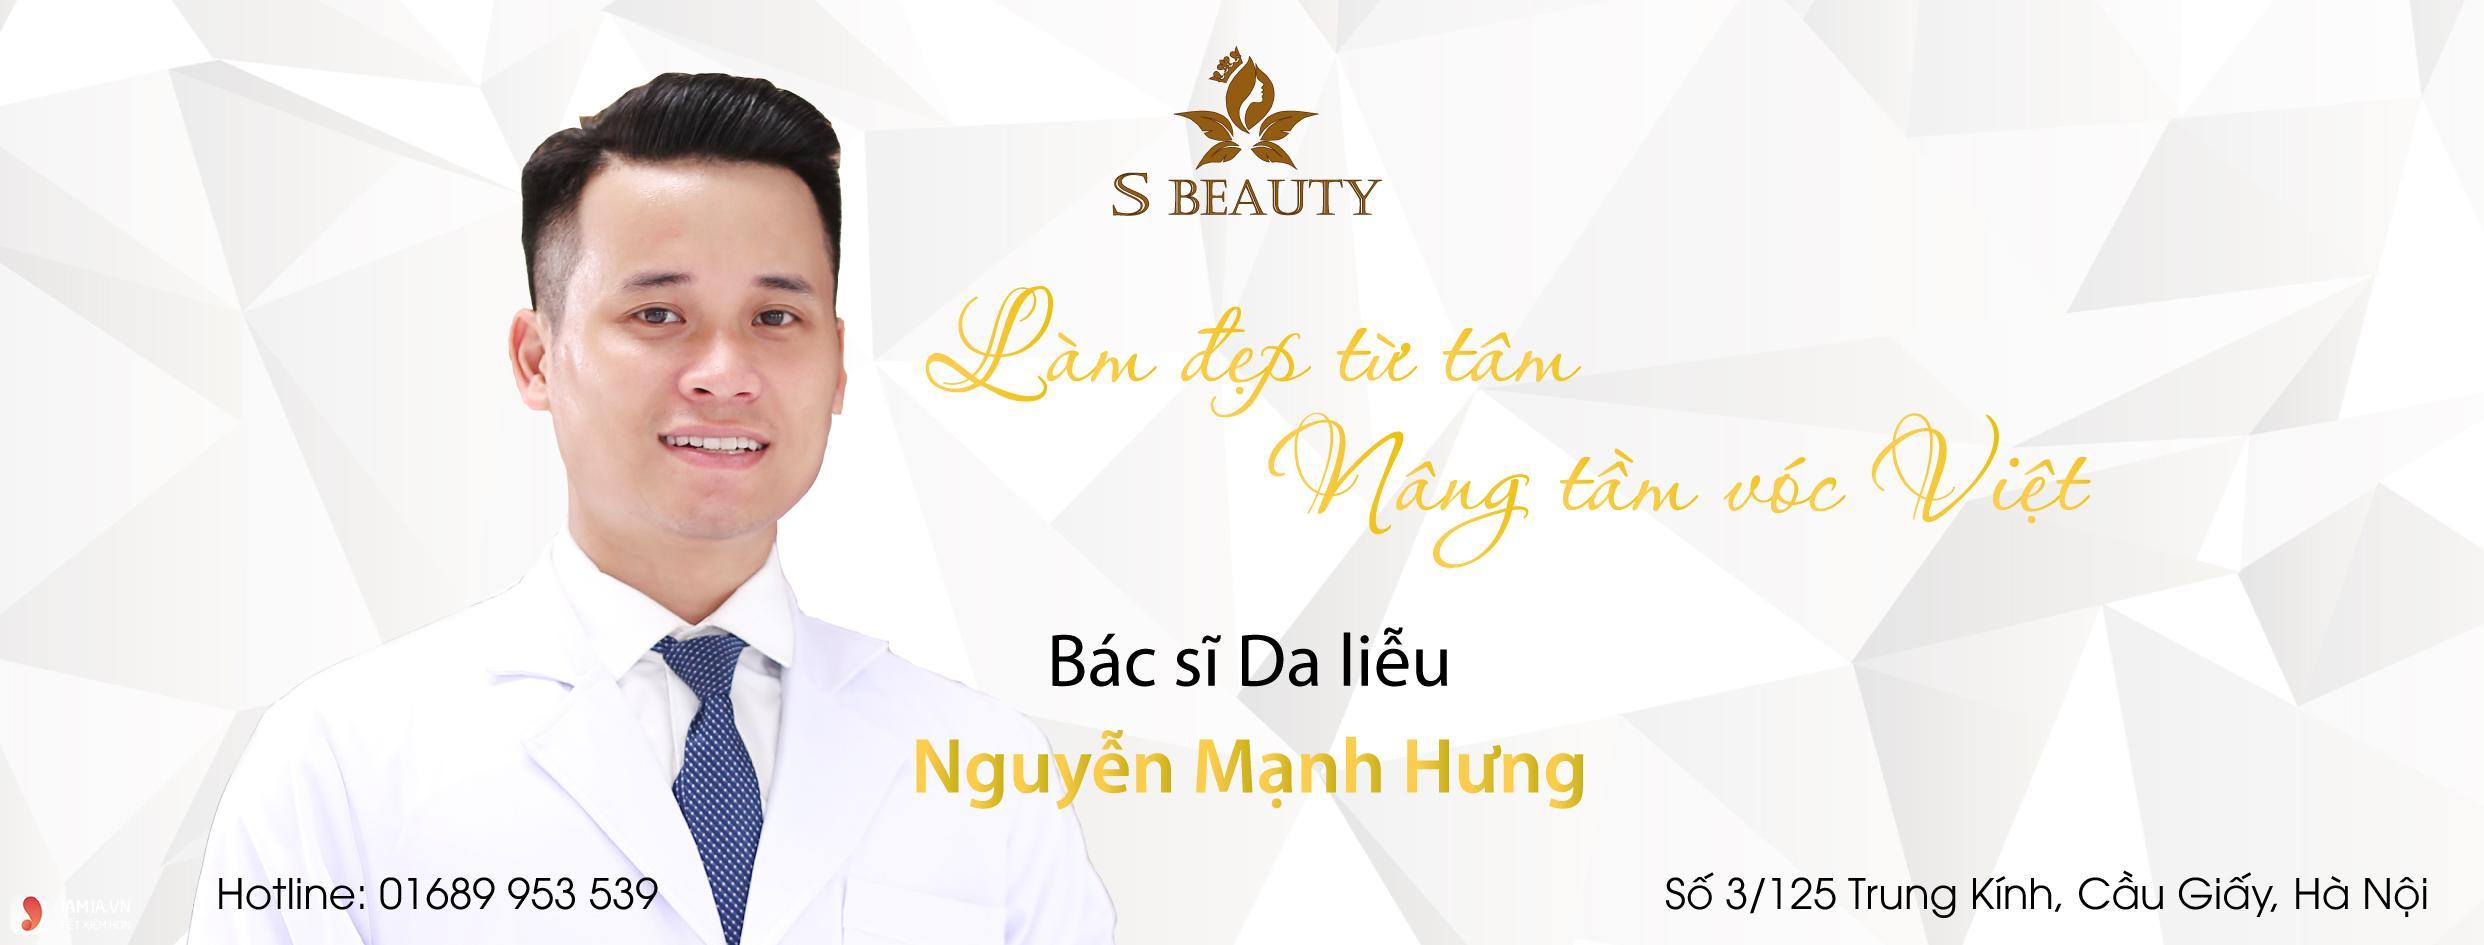 Thẩm mỹ quốc tế S Beauty 1